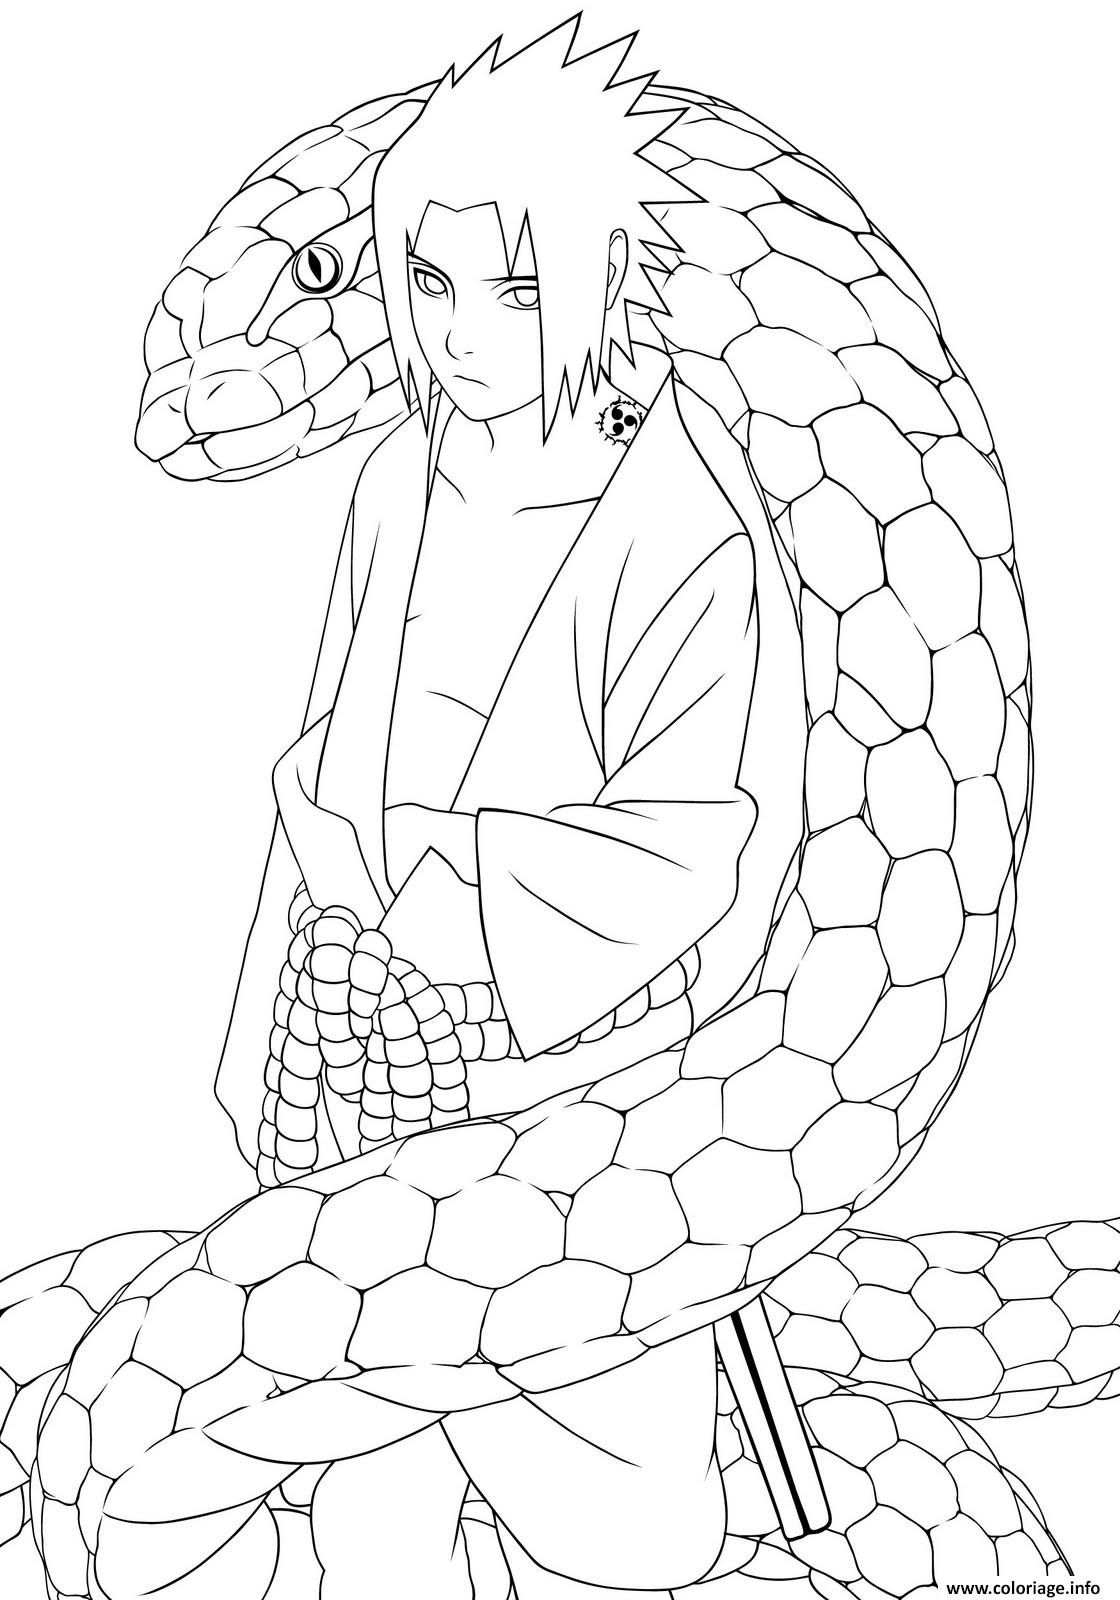 Coloriage manga naruto 2 dessin - Dessin naruto manga ...